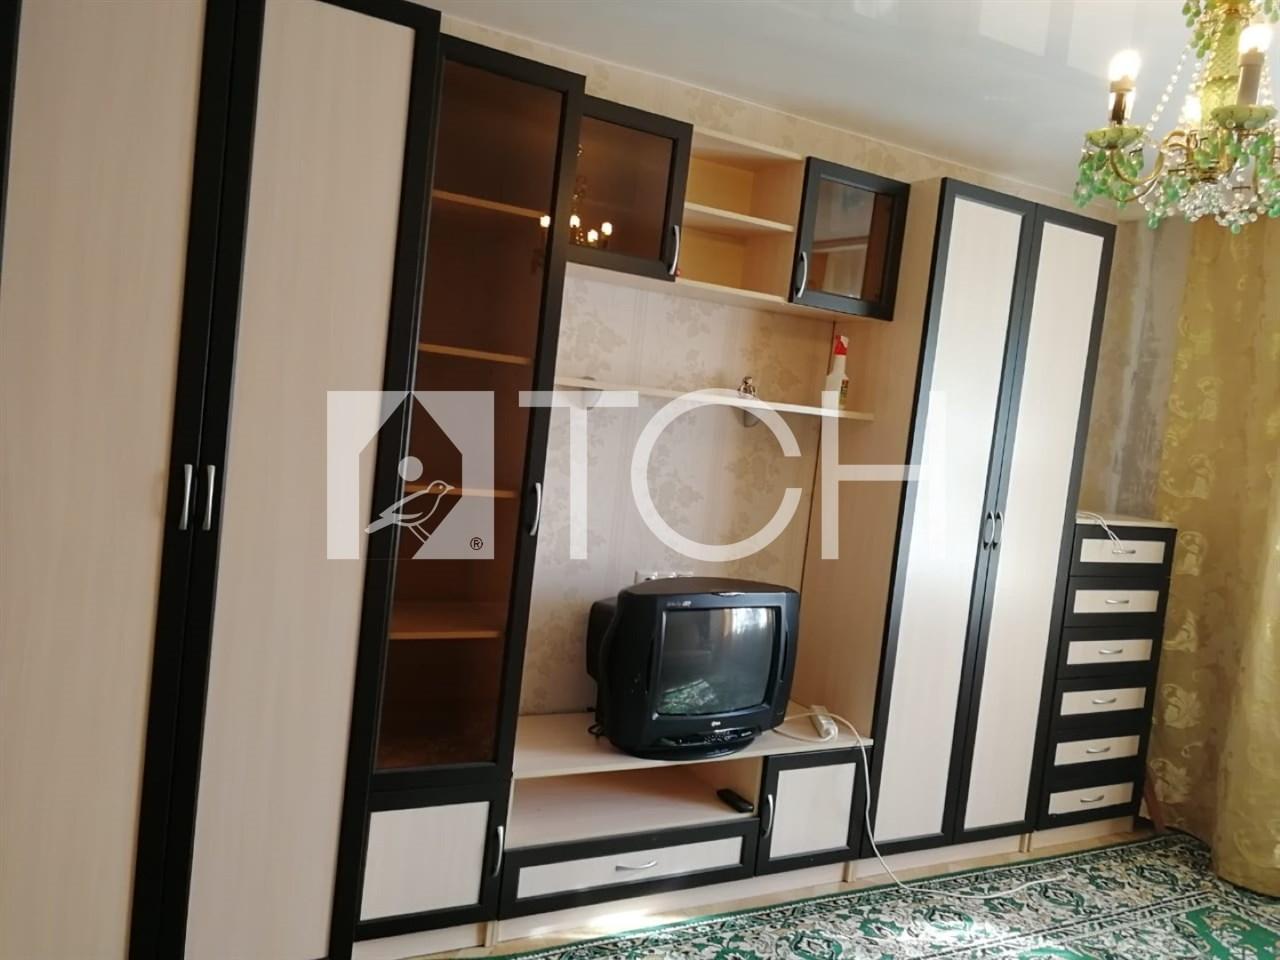 Квартира, 1 комната, 35 м² в Щелково 89261425000 купить 7